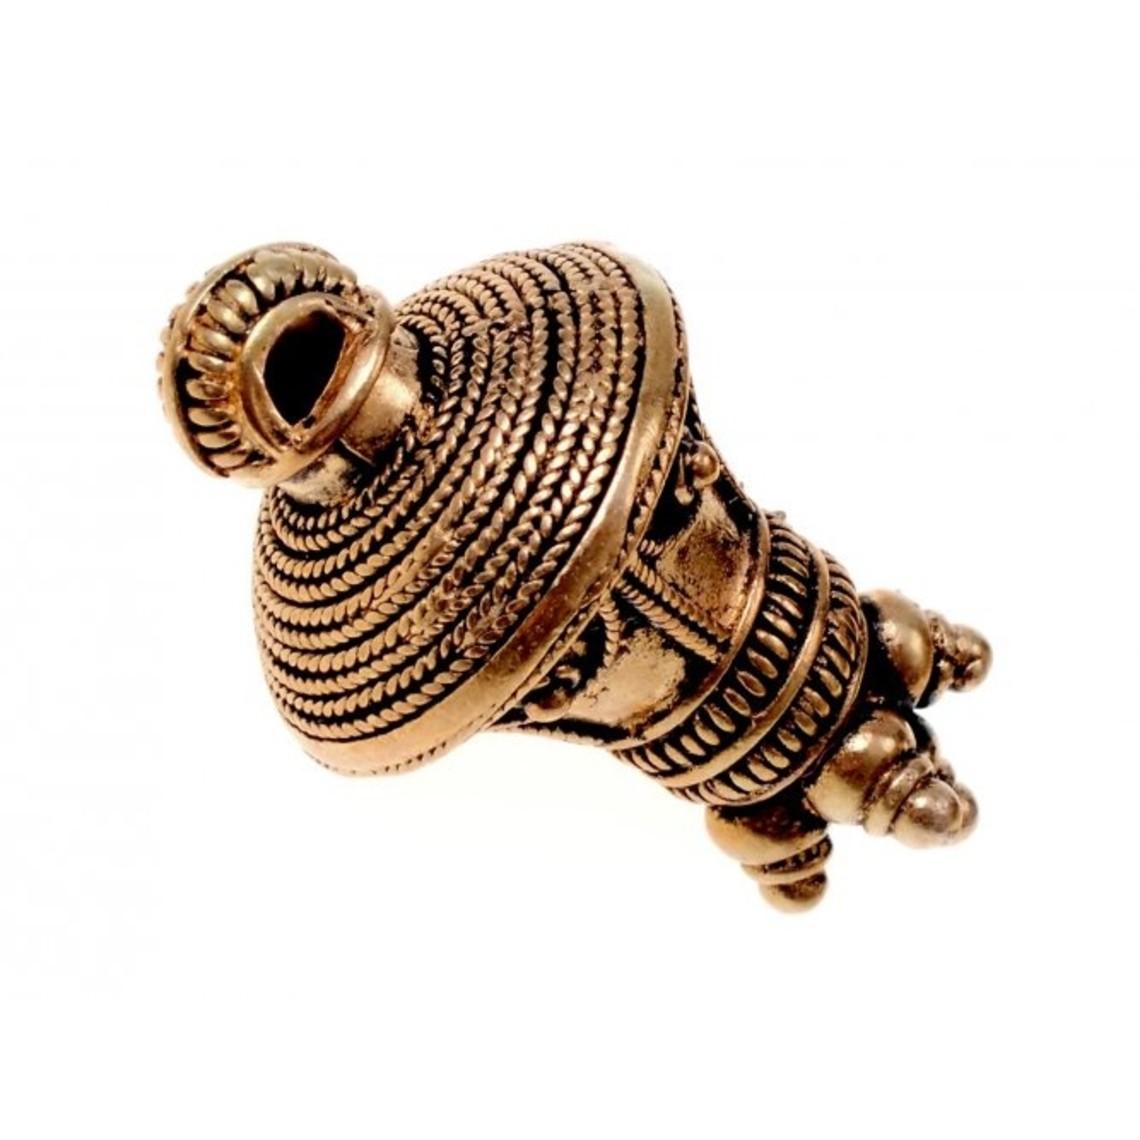 Germansk berlock vedhæng, bronze